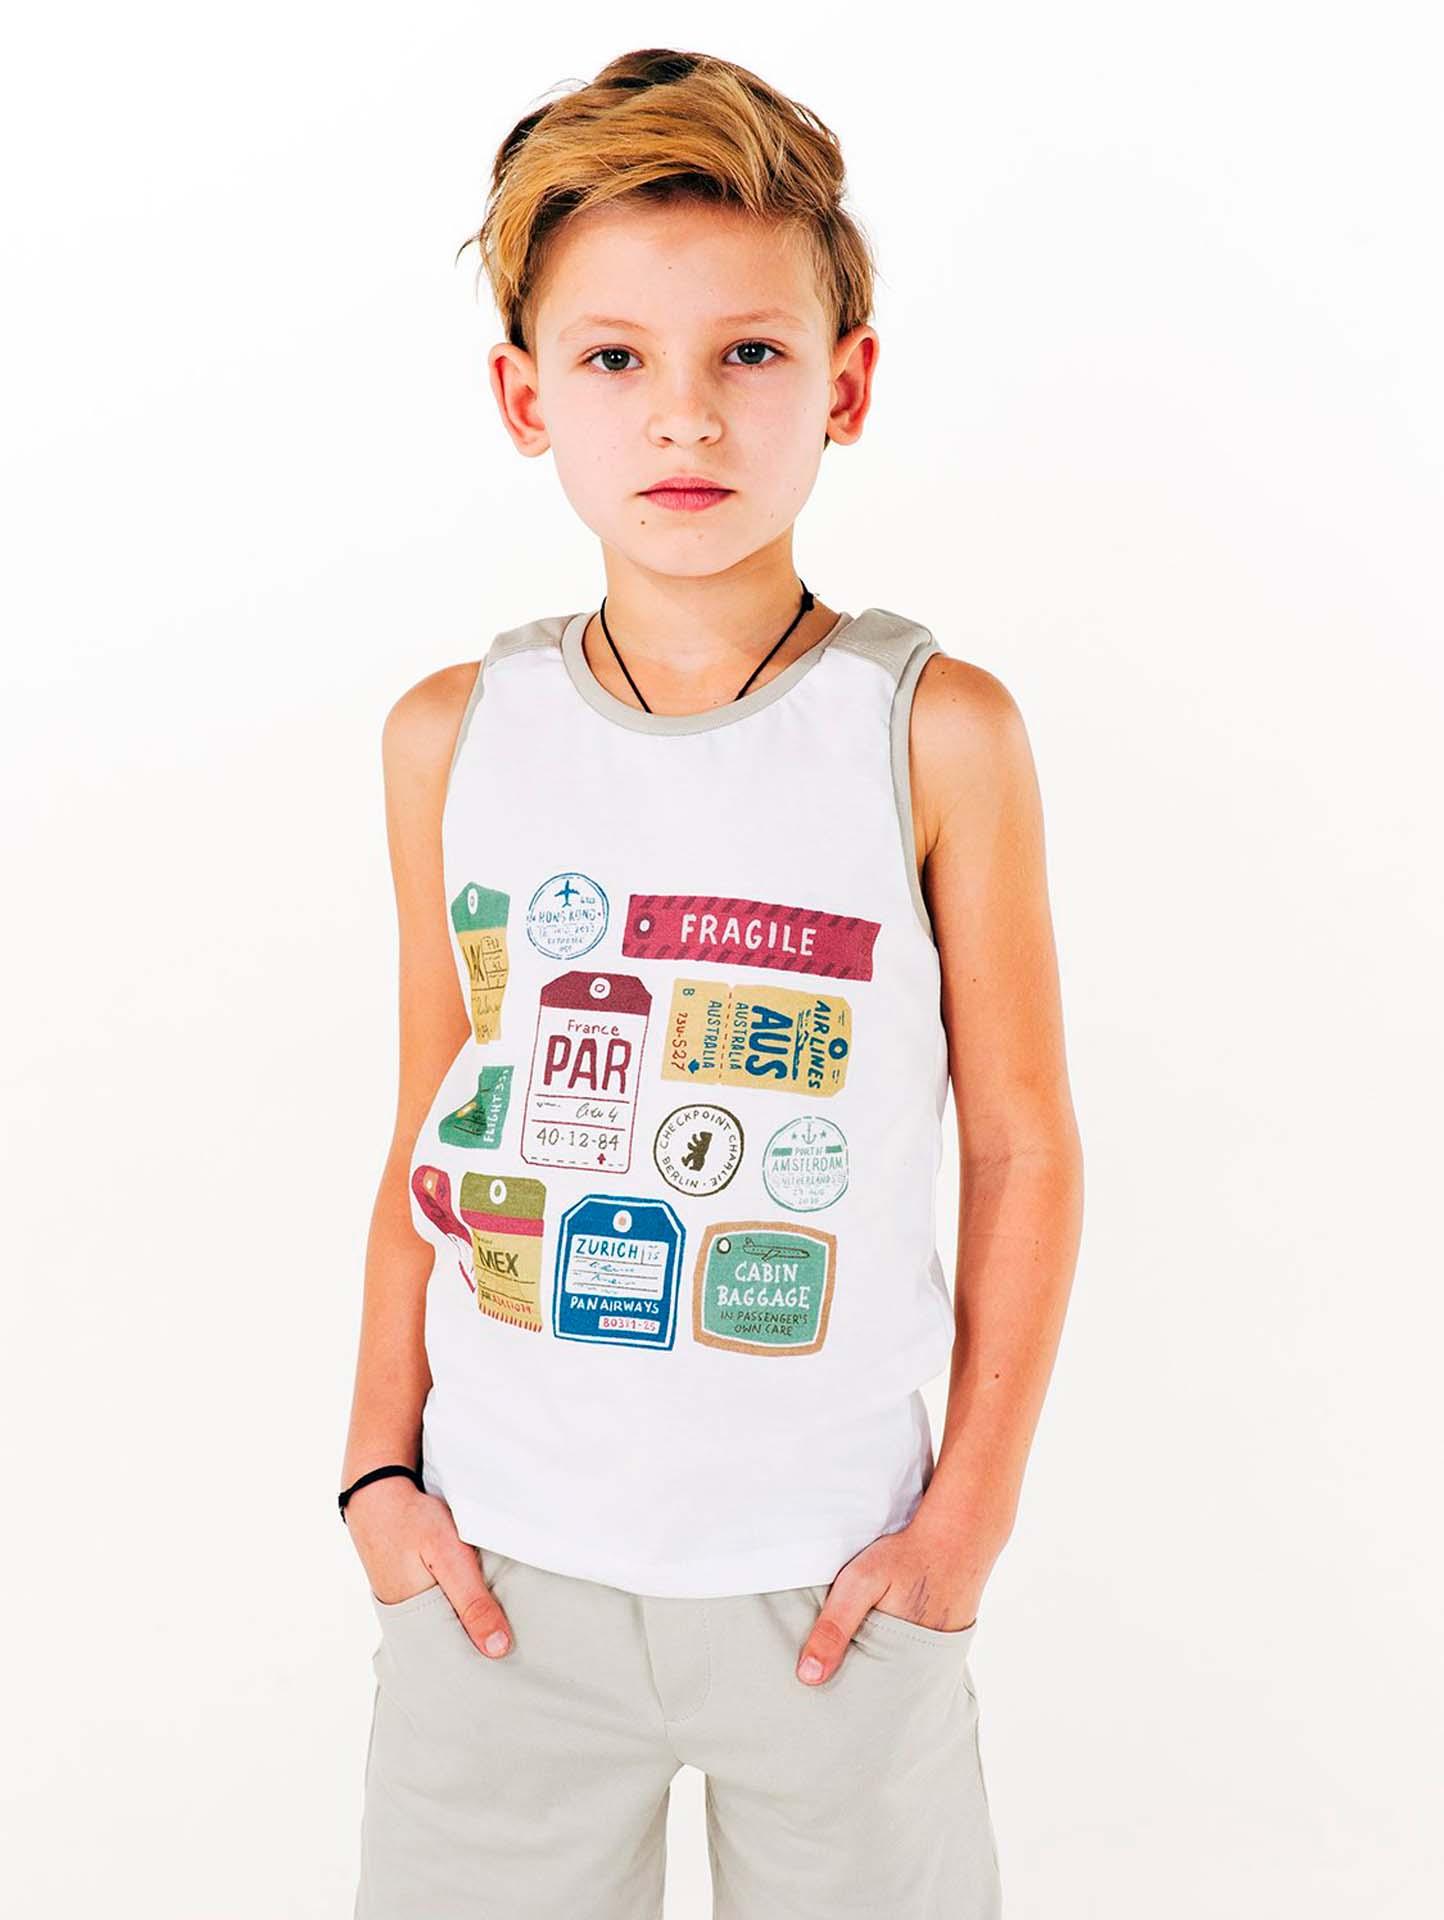 3286d03308638a Одяг для хлопчиків: Футболки   Top Shelf   Купити футболку для ...